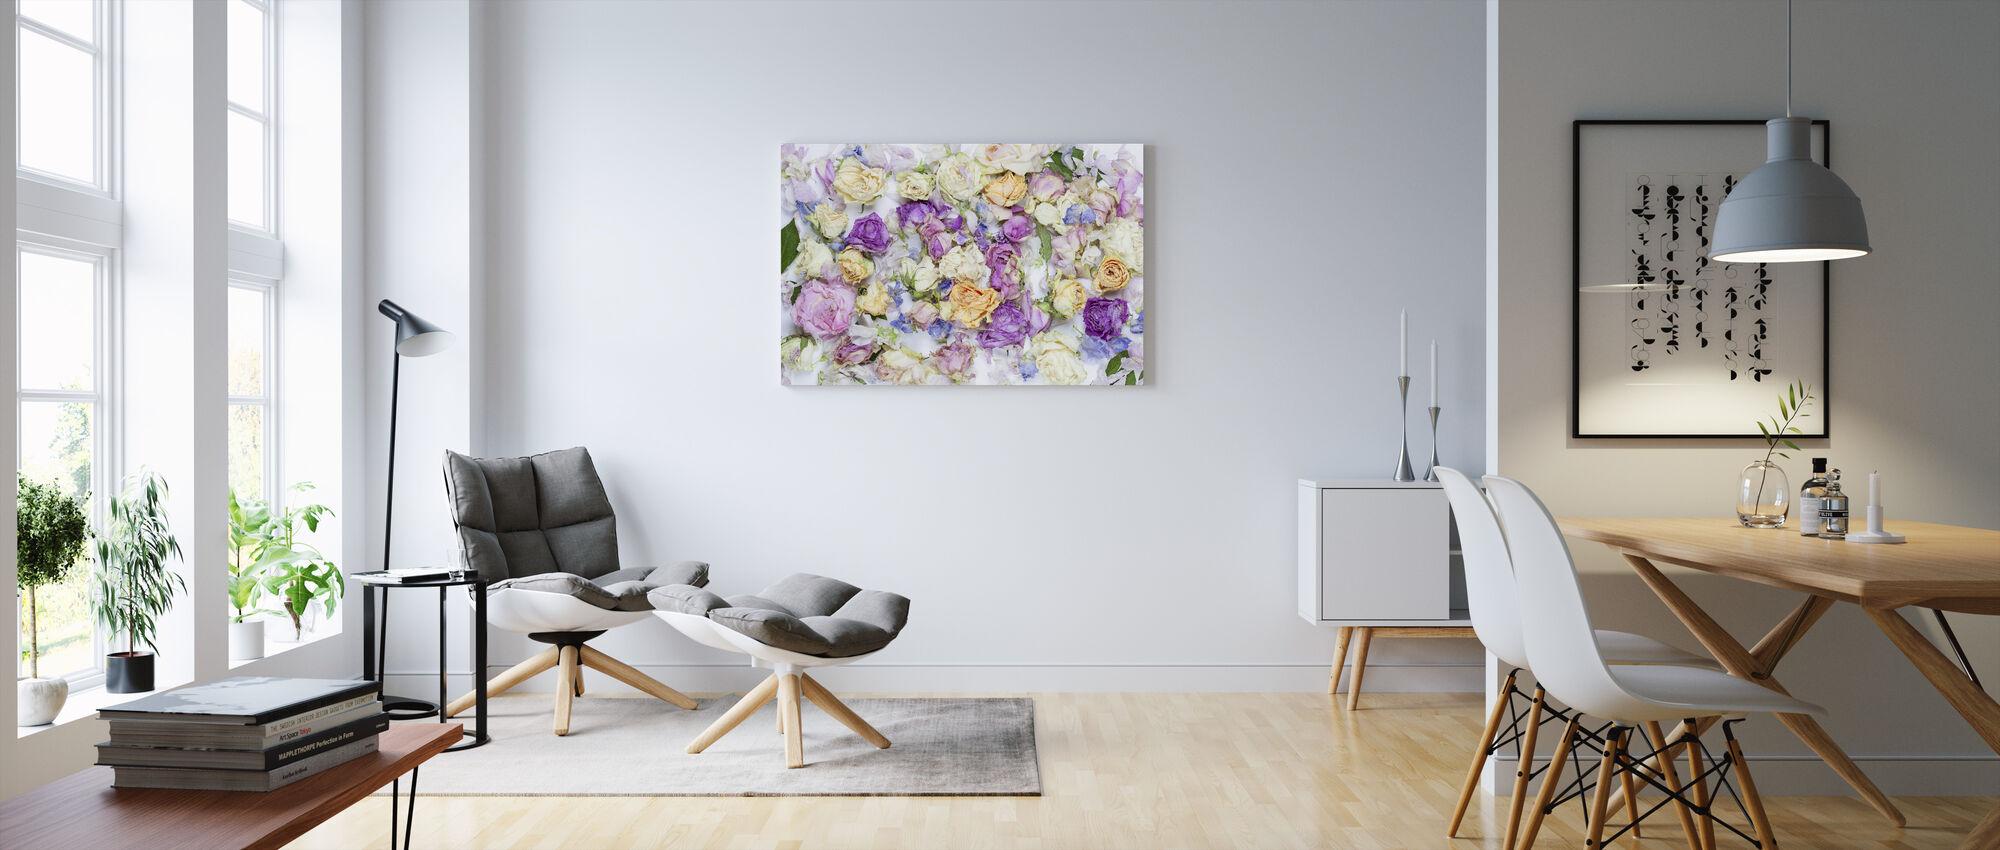 Lovely Flowers - Canvas print - Living Room